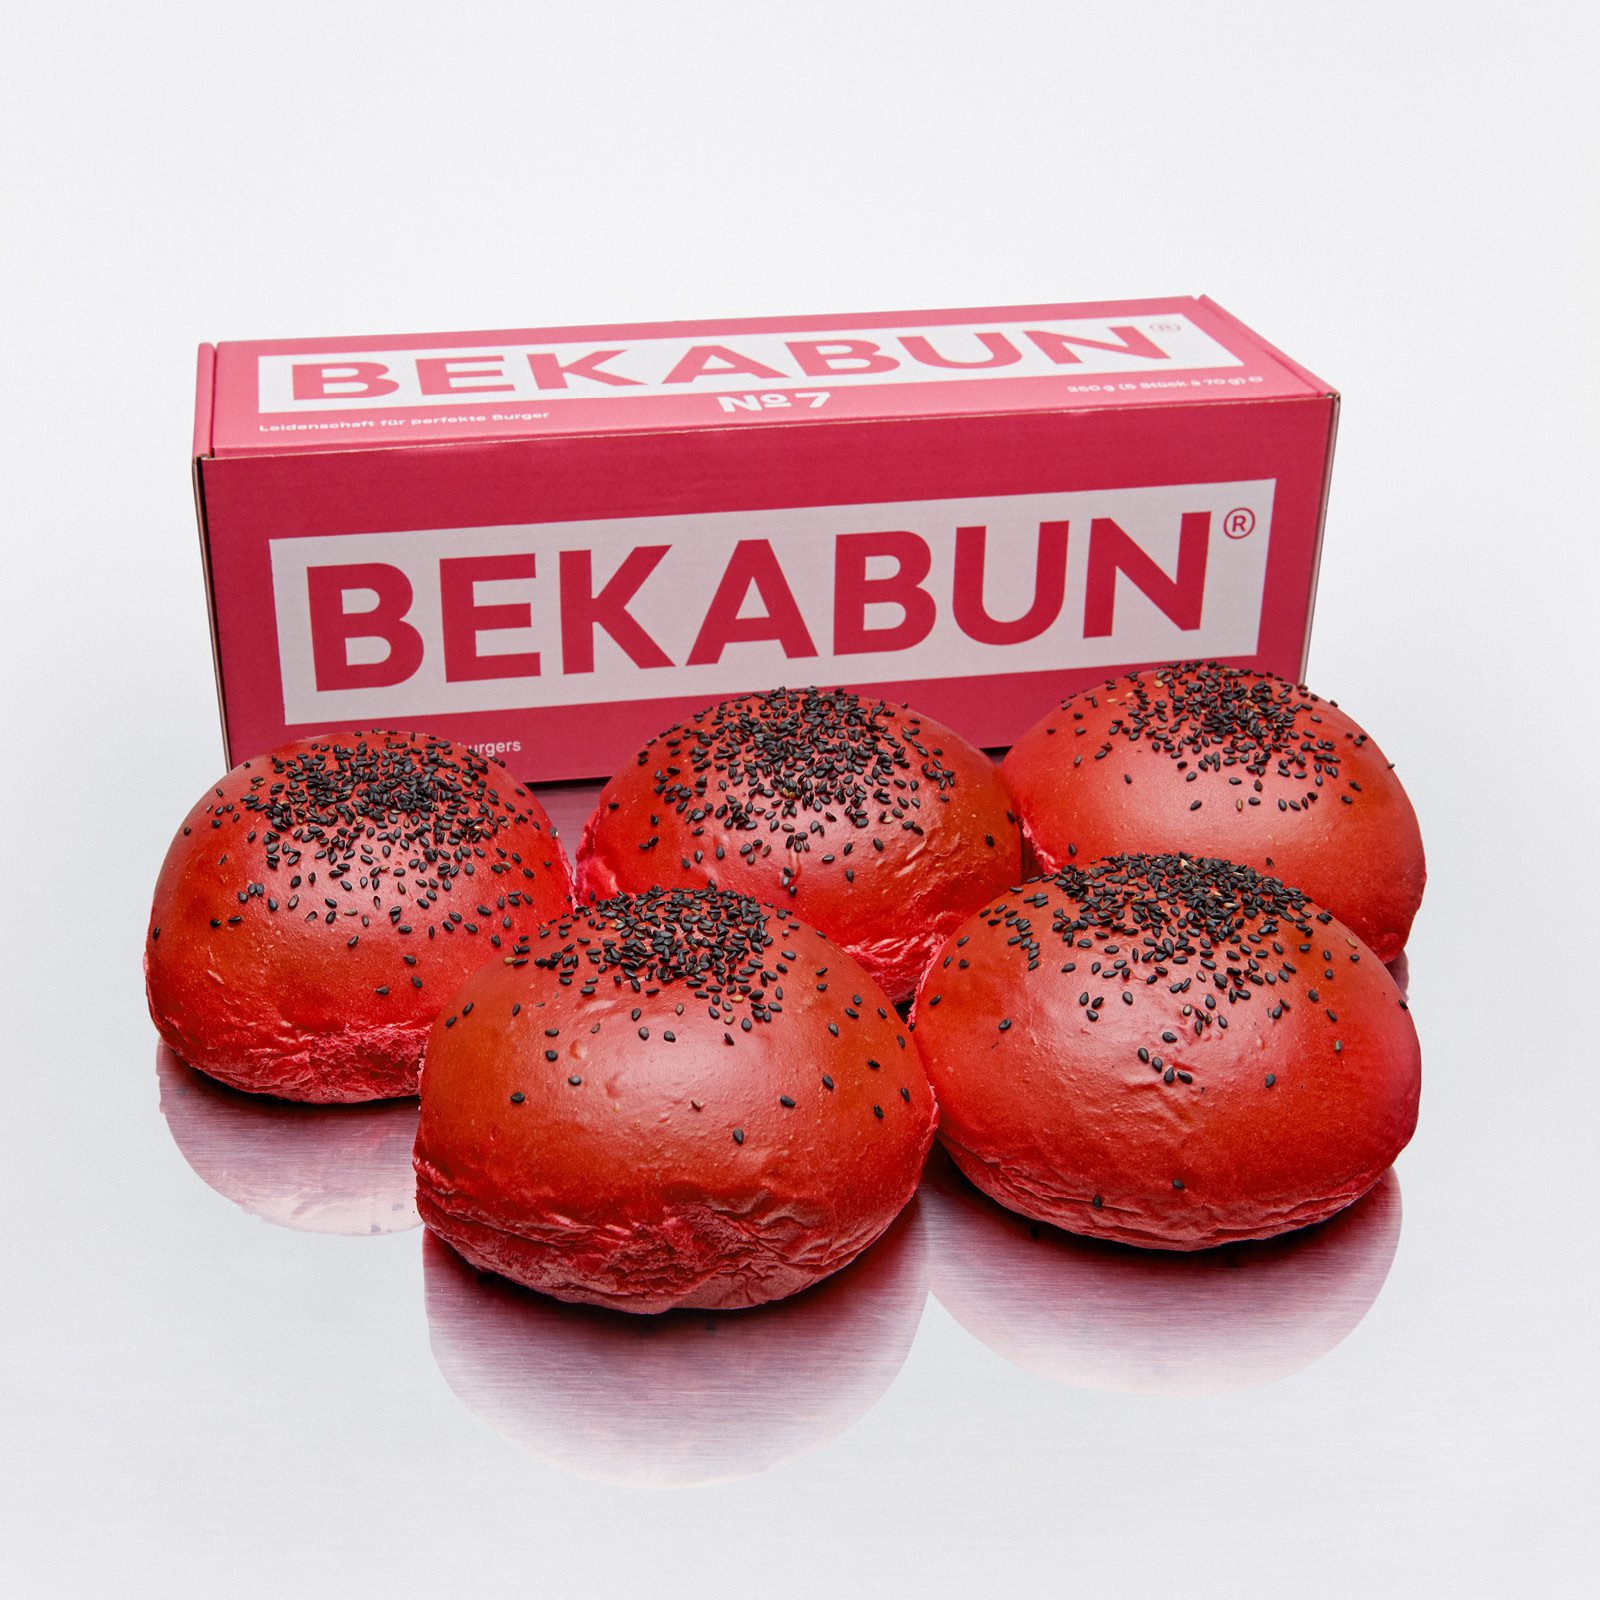 Bekarei BEKABUN No7 Box Foto Referenz der Agentur RIGHT Marketing Berlin.